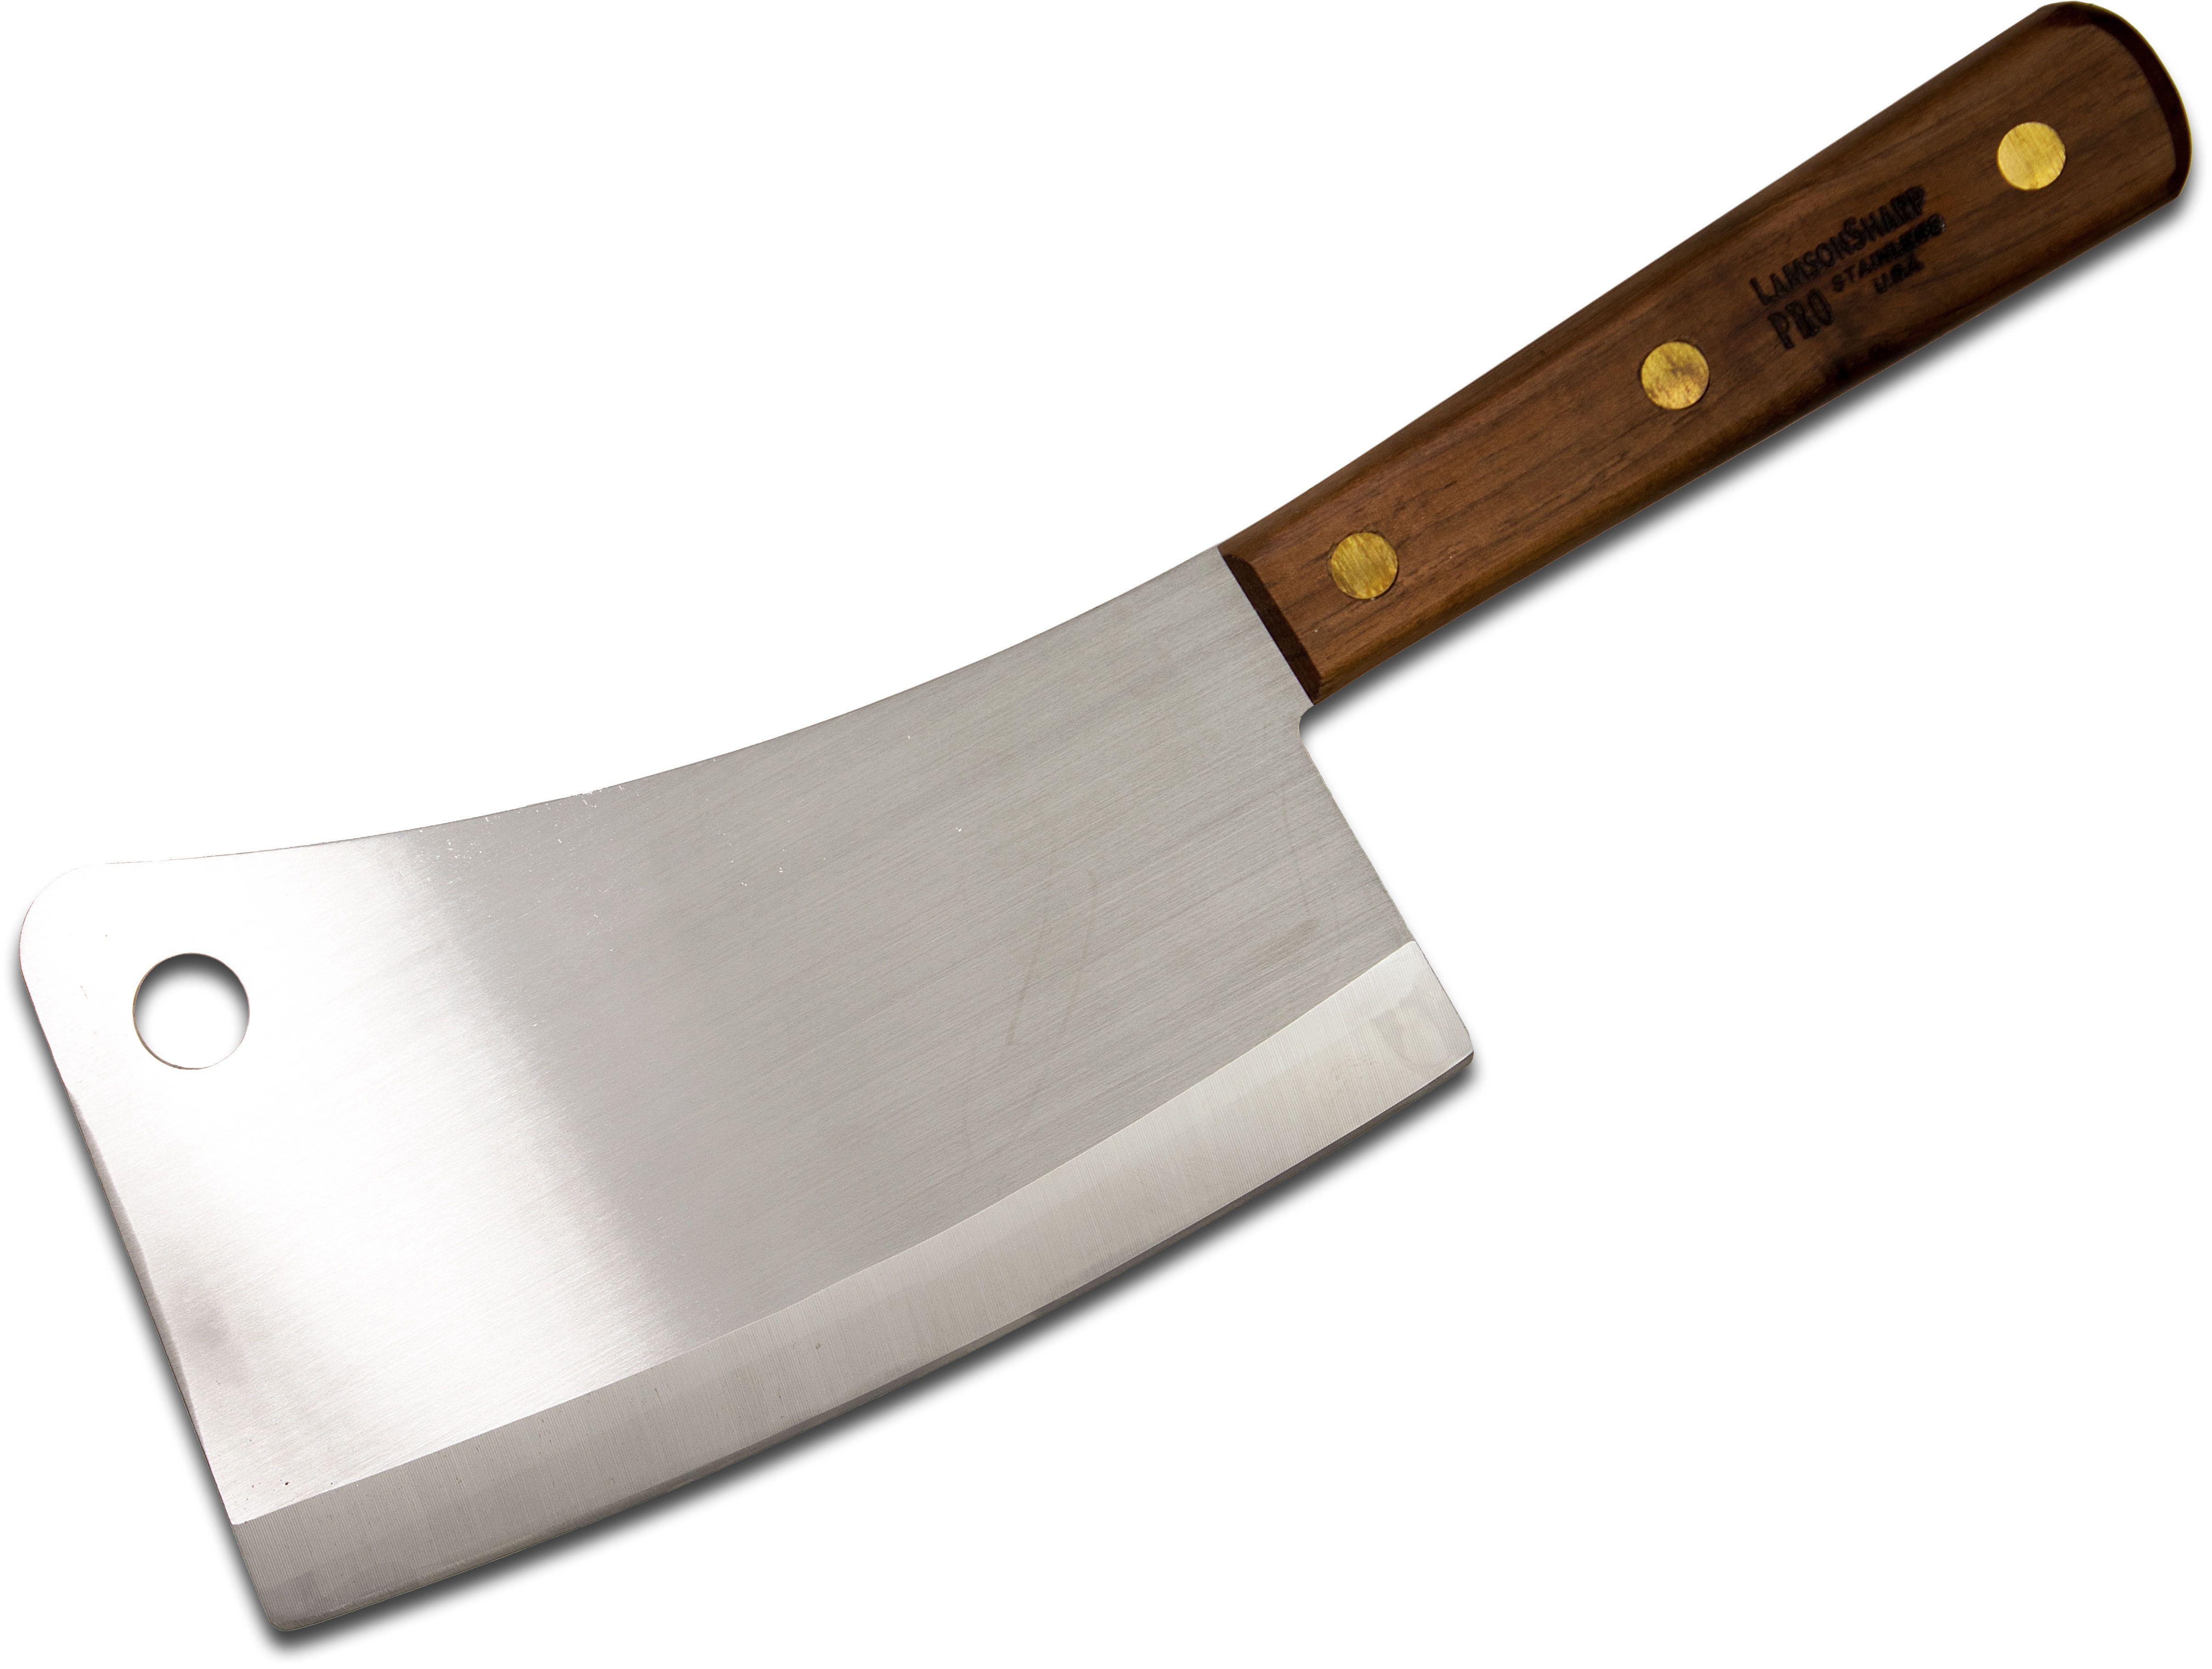 LamsonSharp USA Walnut 7.25 inch Meat Cleaver, Walnut Handles